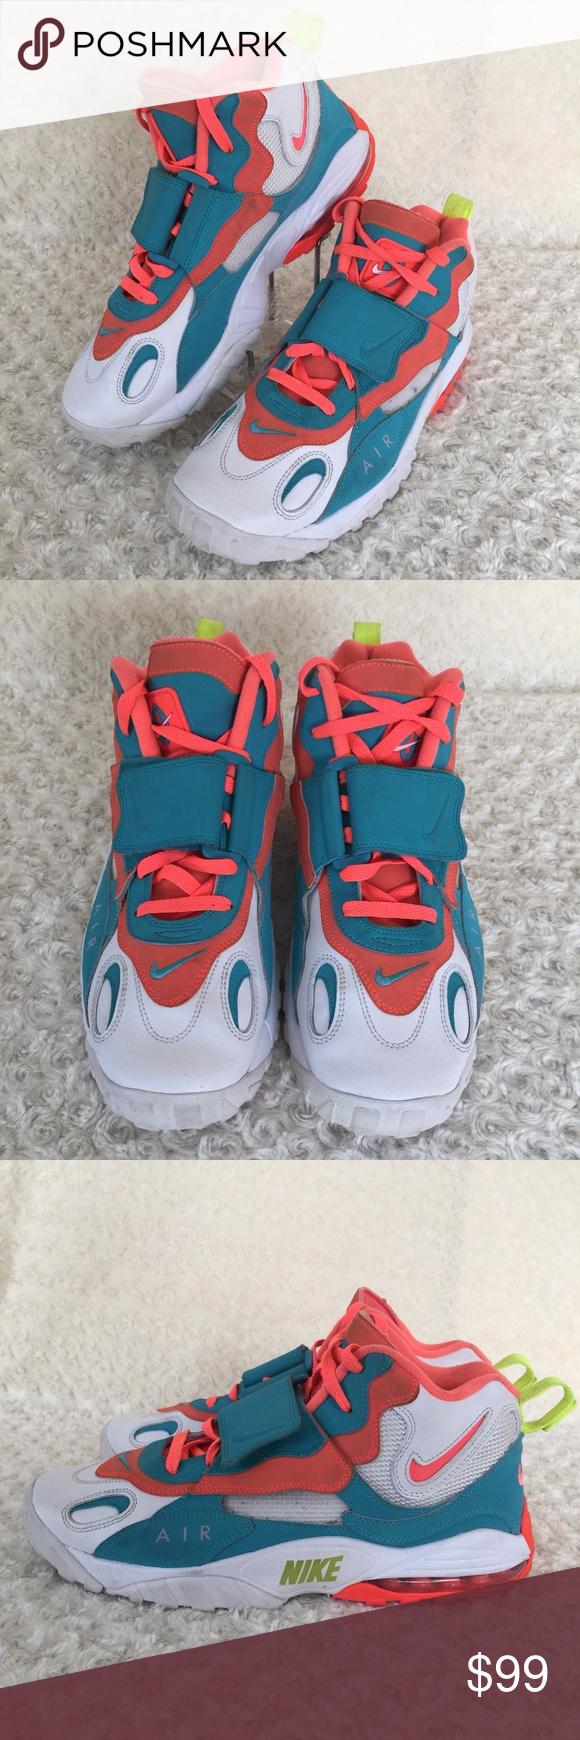 separation shoes 86dda 673be Nike Air Max Speed Men s Turf Shoes 525225-102 Nike Air Max Speed Turf Sz